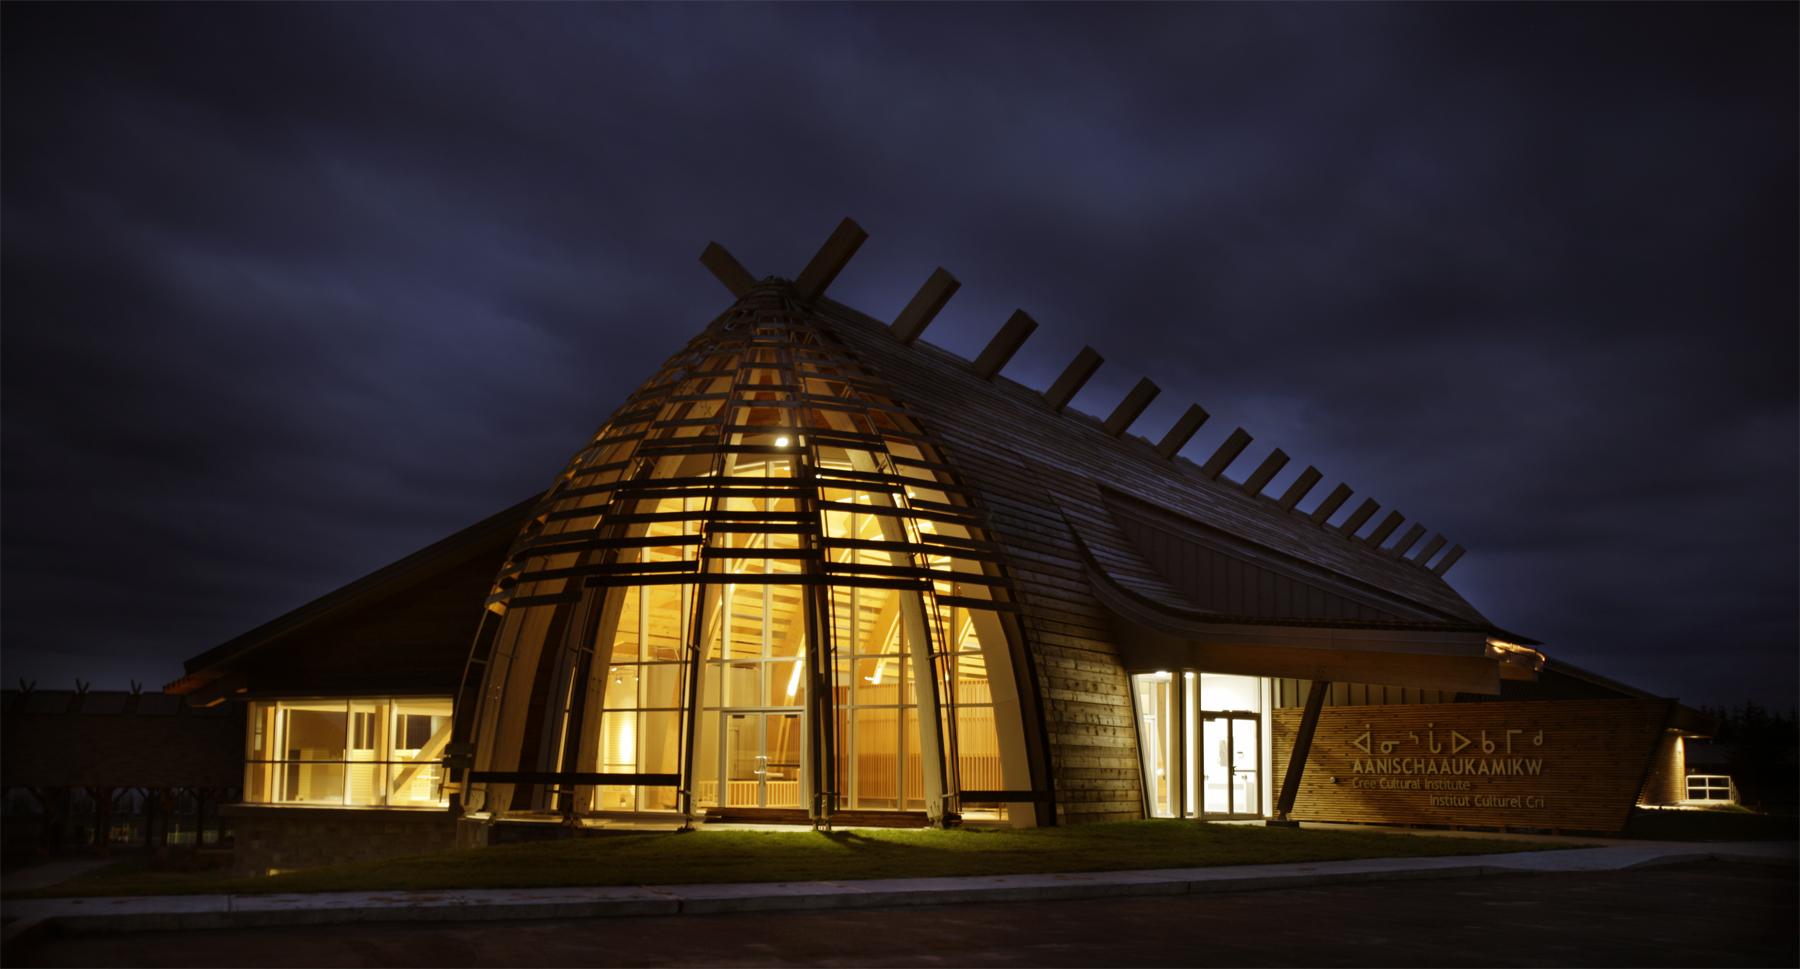 L'Institut culturel cri d'Oujé-Bougoumou. (l'Institut culturel cri d'Oujé-Bougoumou)